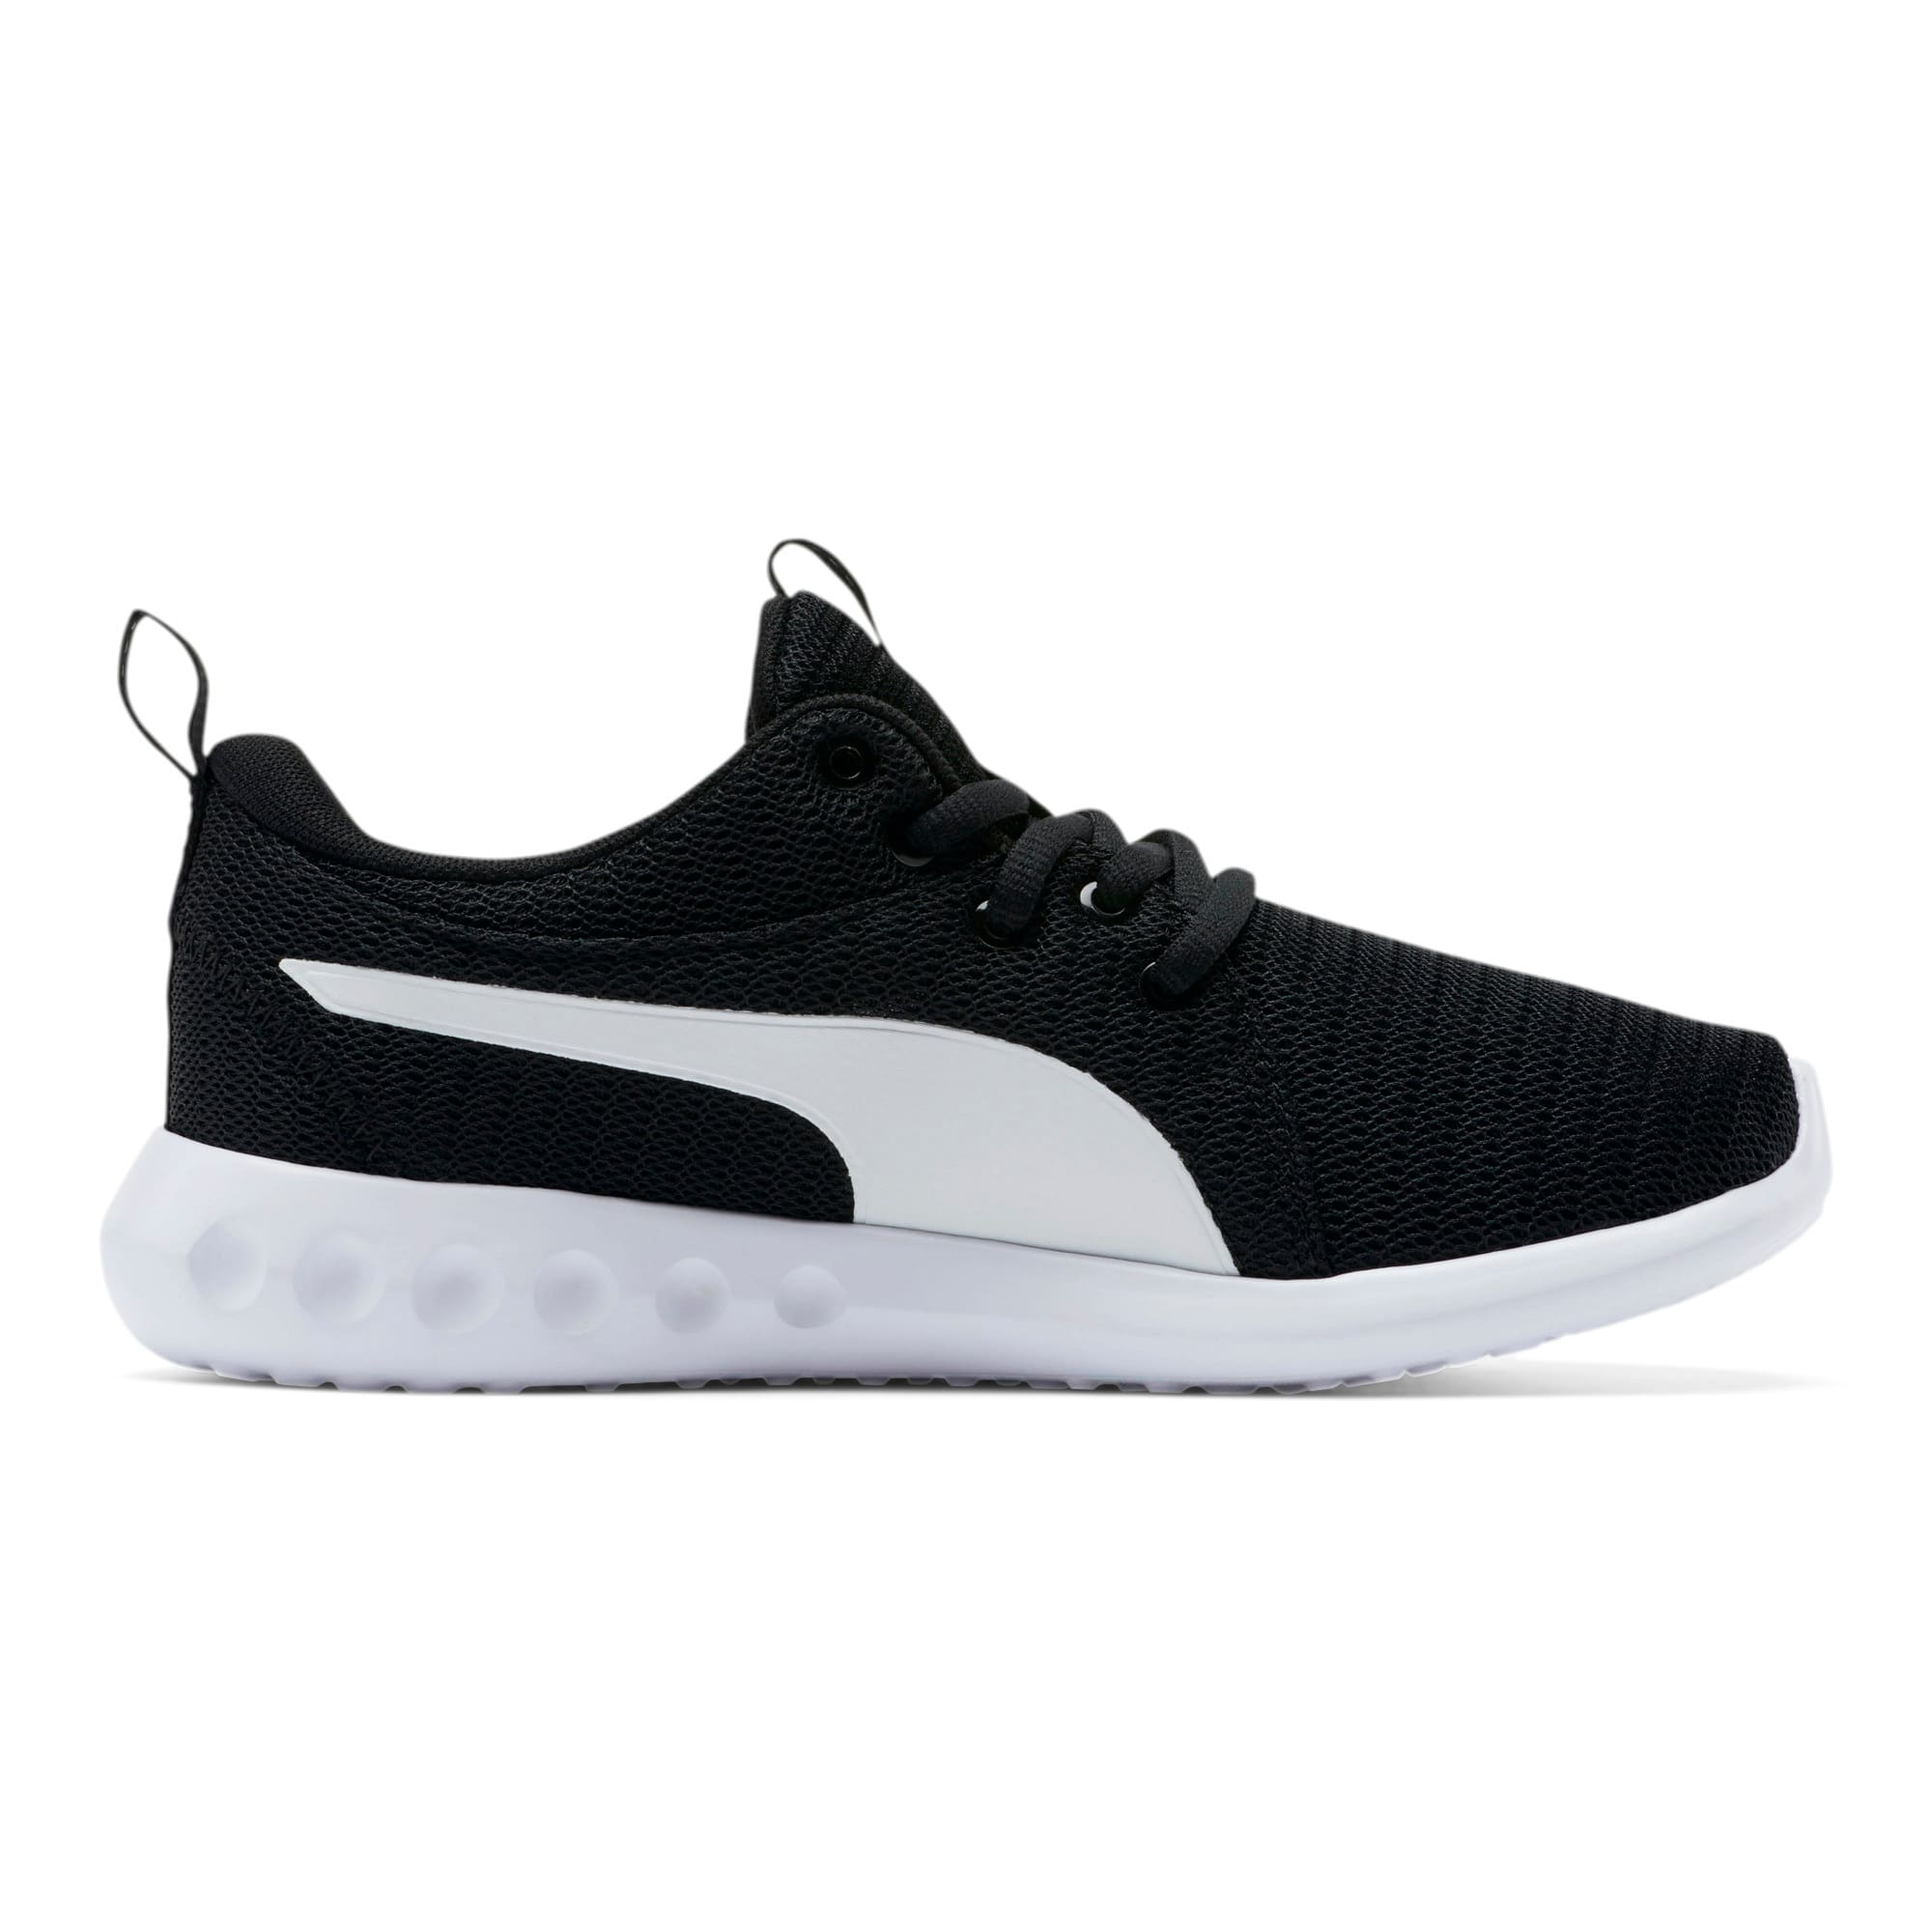 Thumbnail 5 of Carson 2 Sneakers JR, Puma Black-Puma White, medium